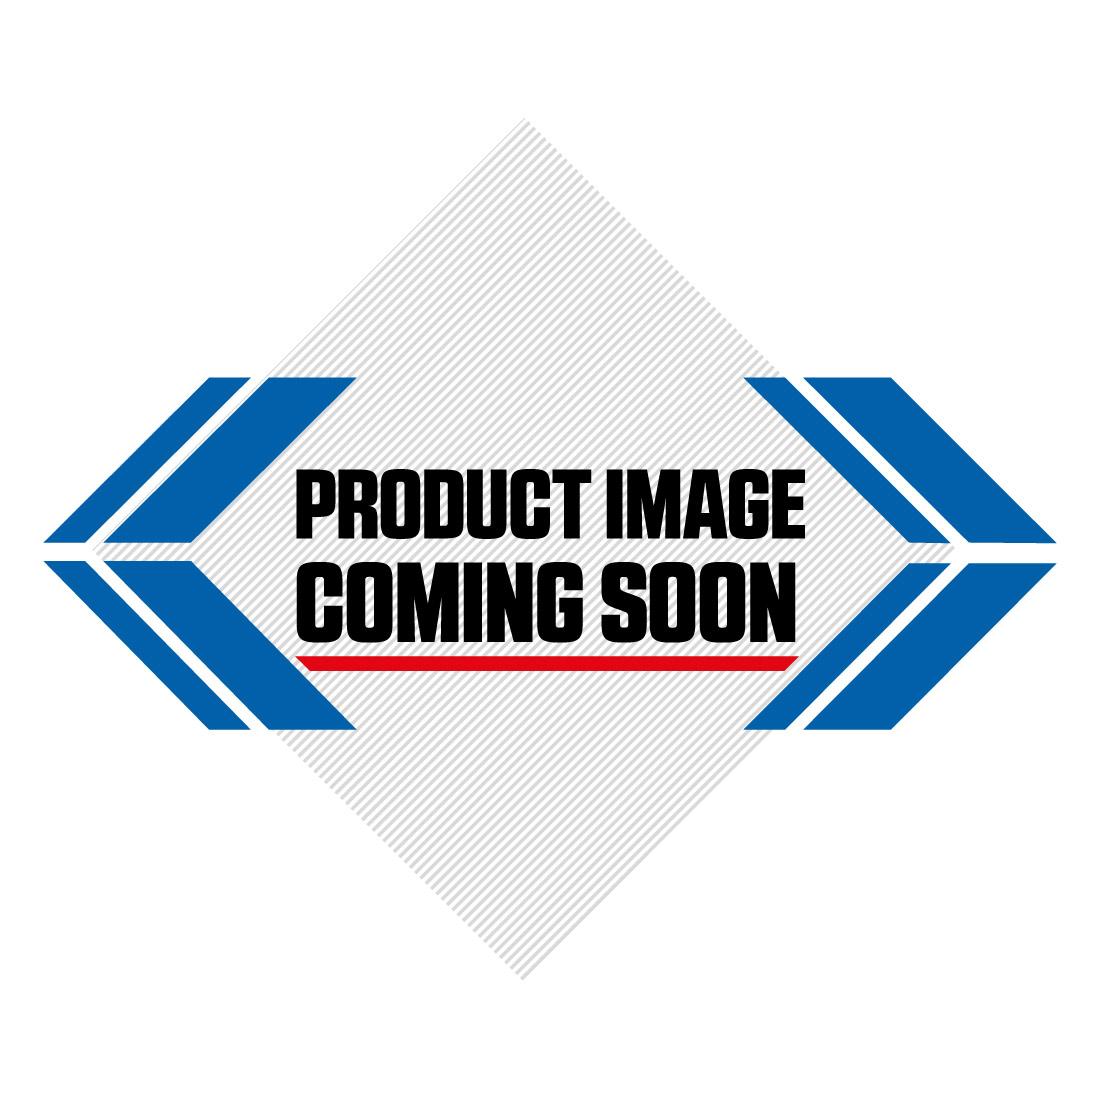 DJI Mavic Pro Fly More Combo 4K Quadcopter Drone Image-4